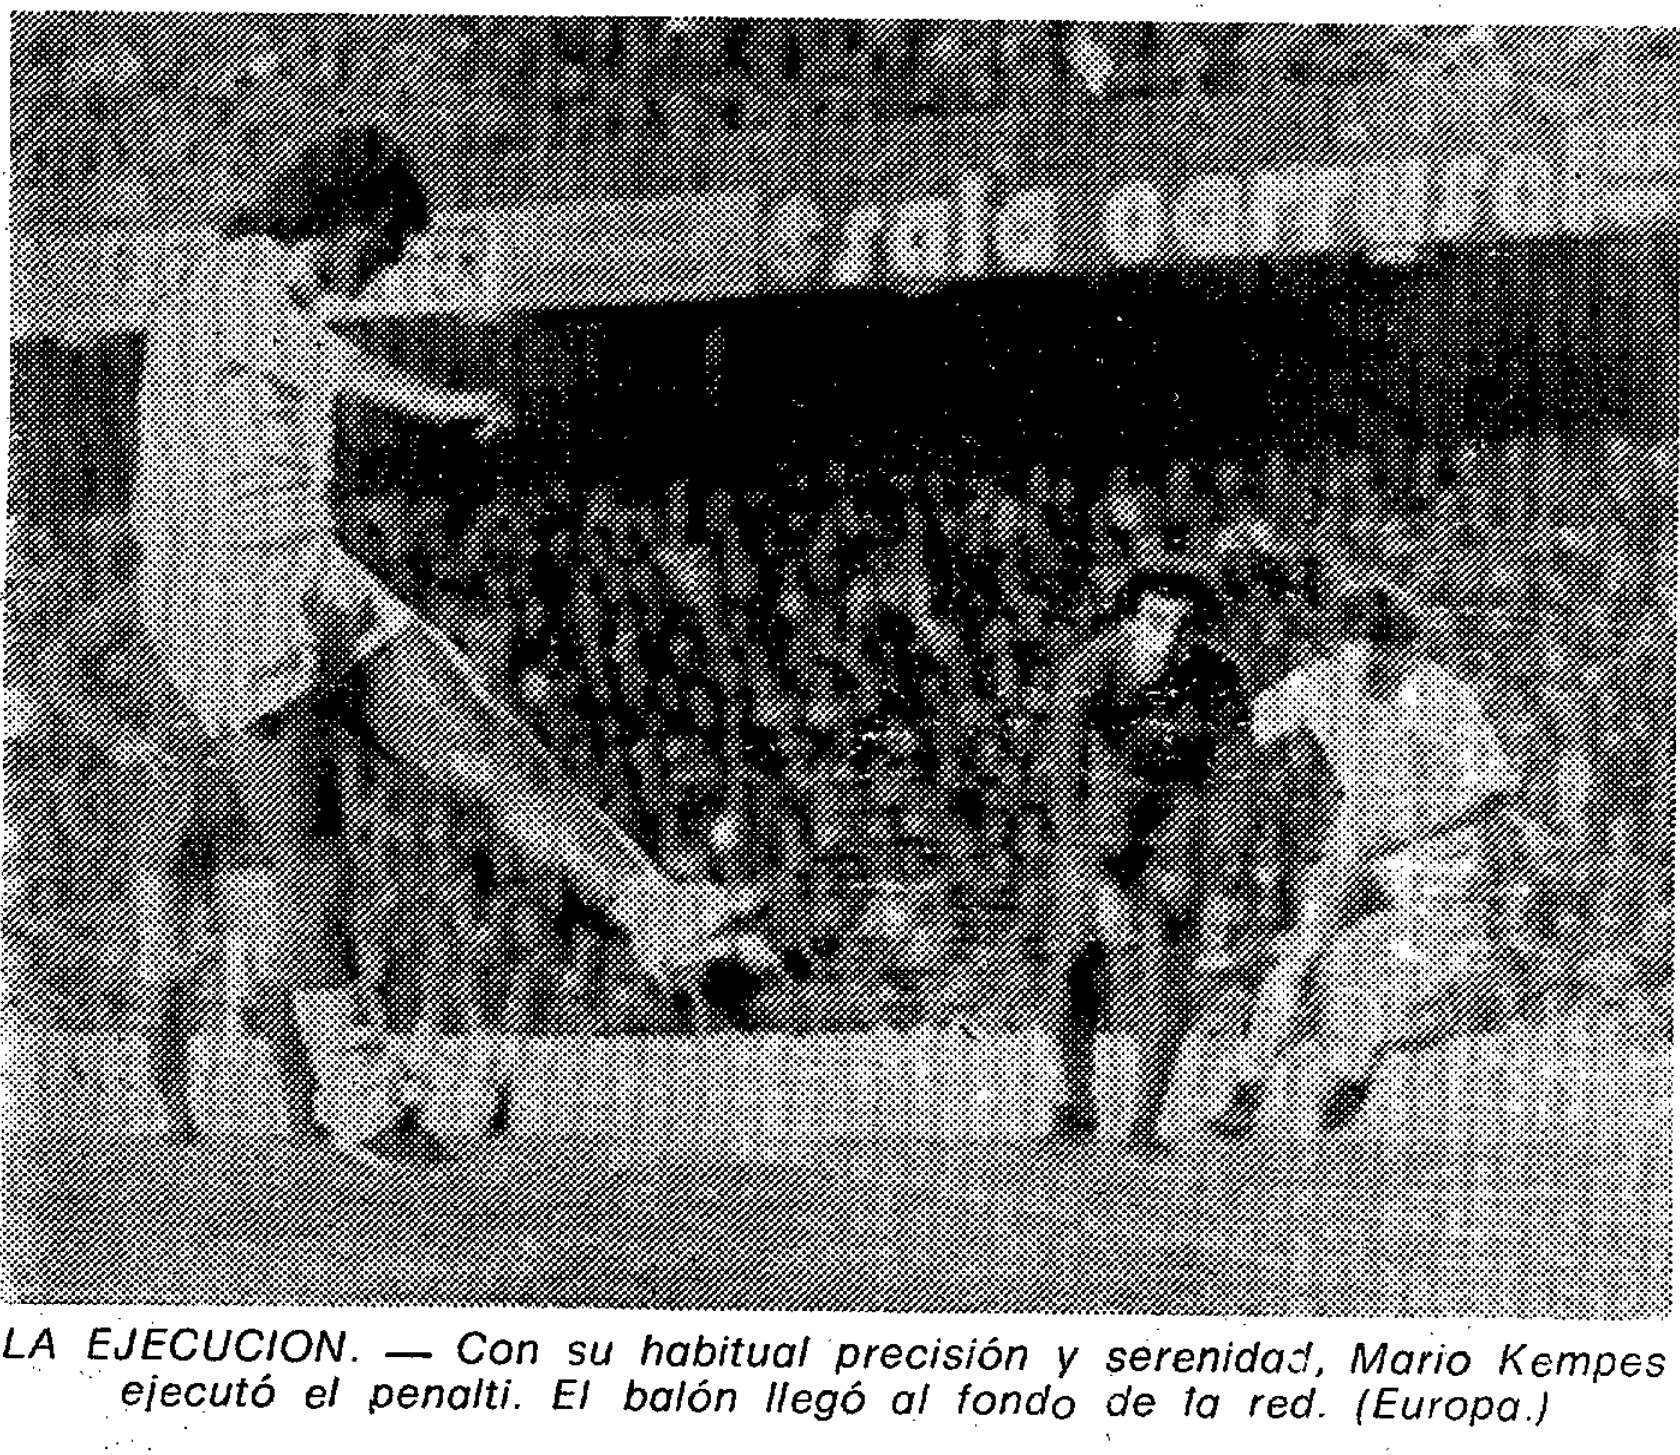 18.10.1980: Valencia CF 2 - 1 Real Madrid